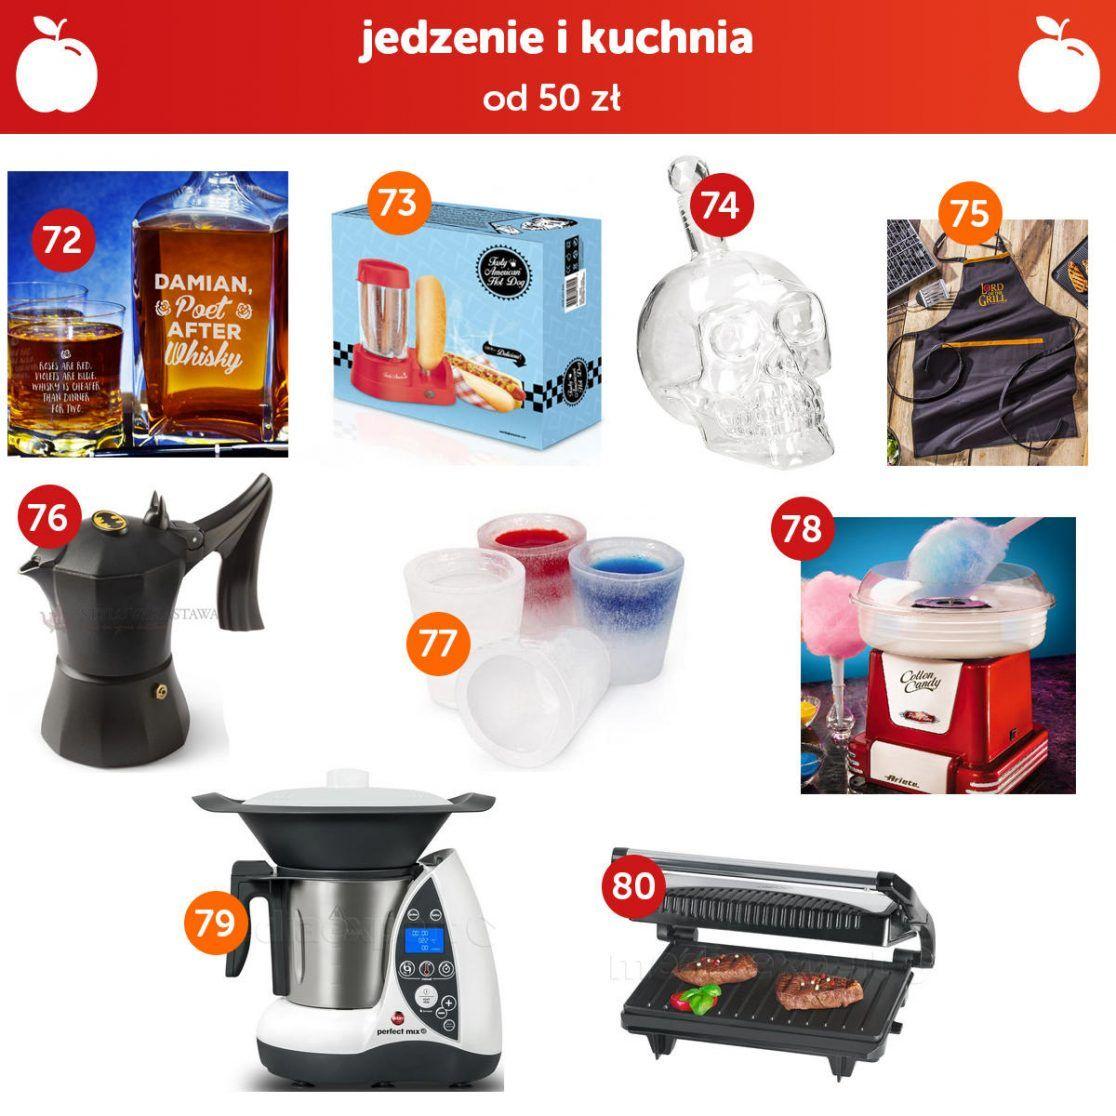 150 Pomyslow Na Prezent Dzien Chlopaka Z Alerabat Udane Zakupy By Alerabat Com Kitchen Appliances Popcorn Maker